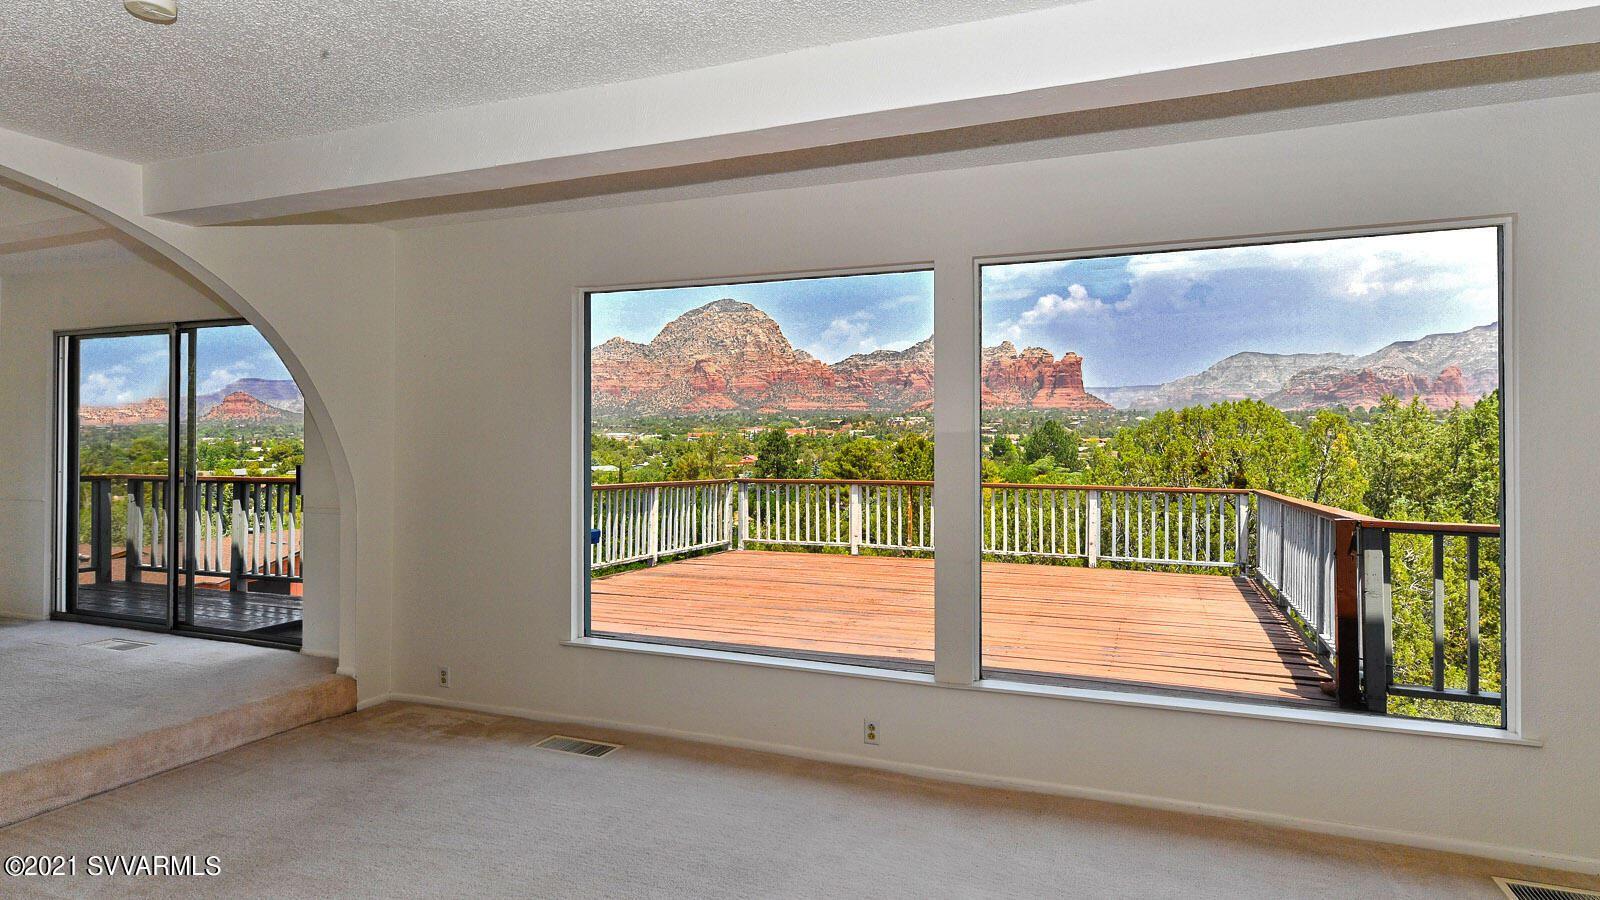 Photo of 460 Panorama Blvd, Sedona, AZ 86336 (MLS # 527143)